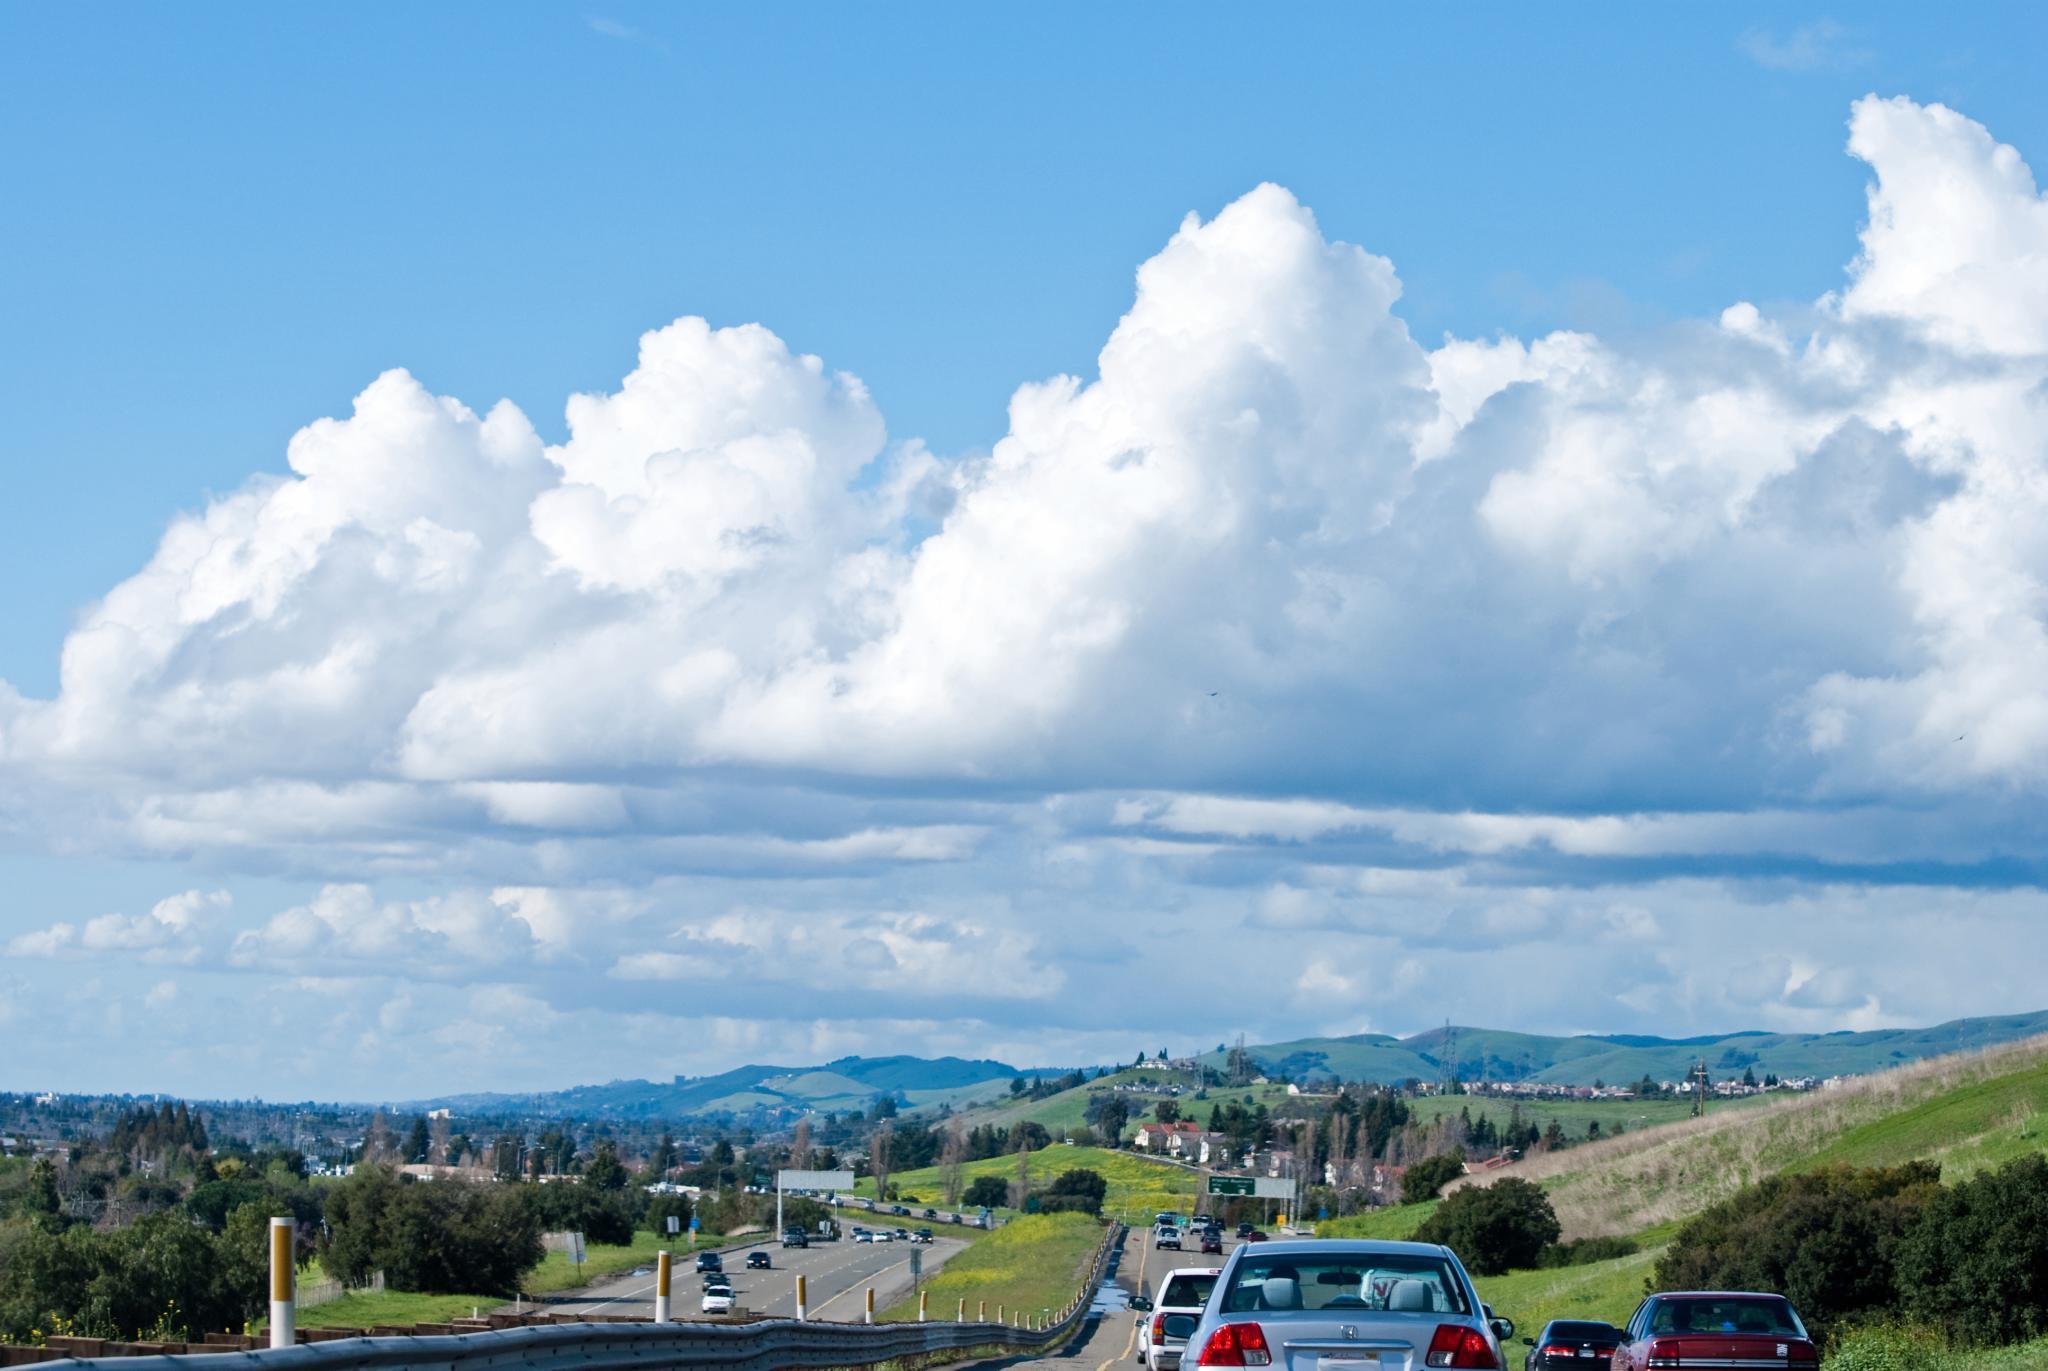 Flat bottom clouds